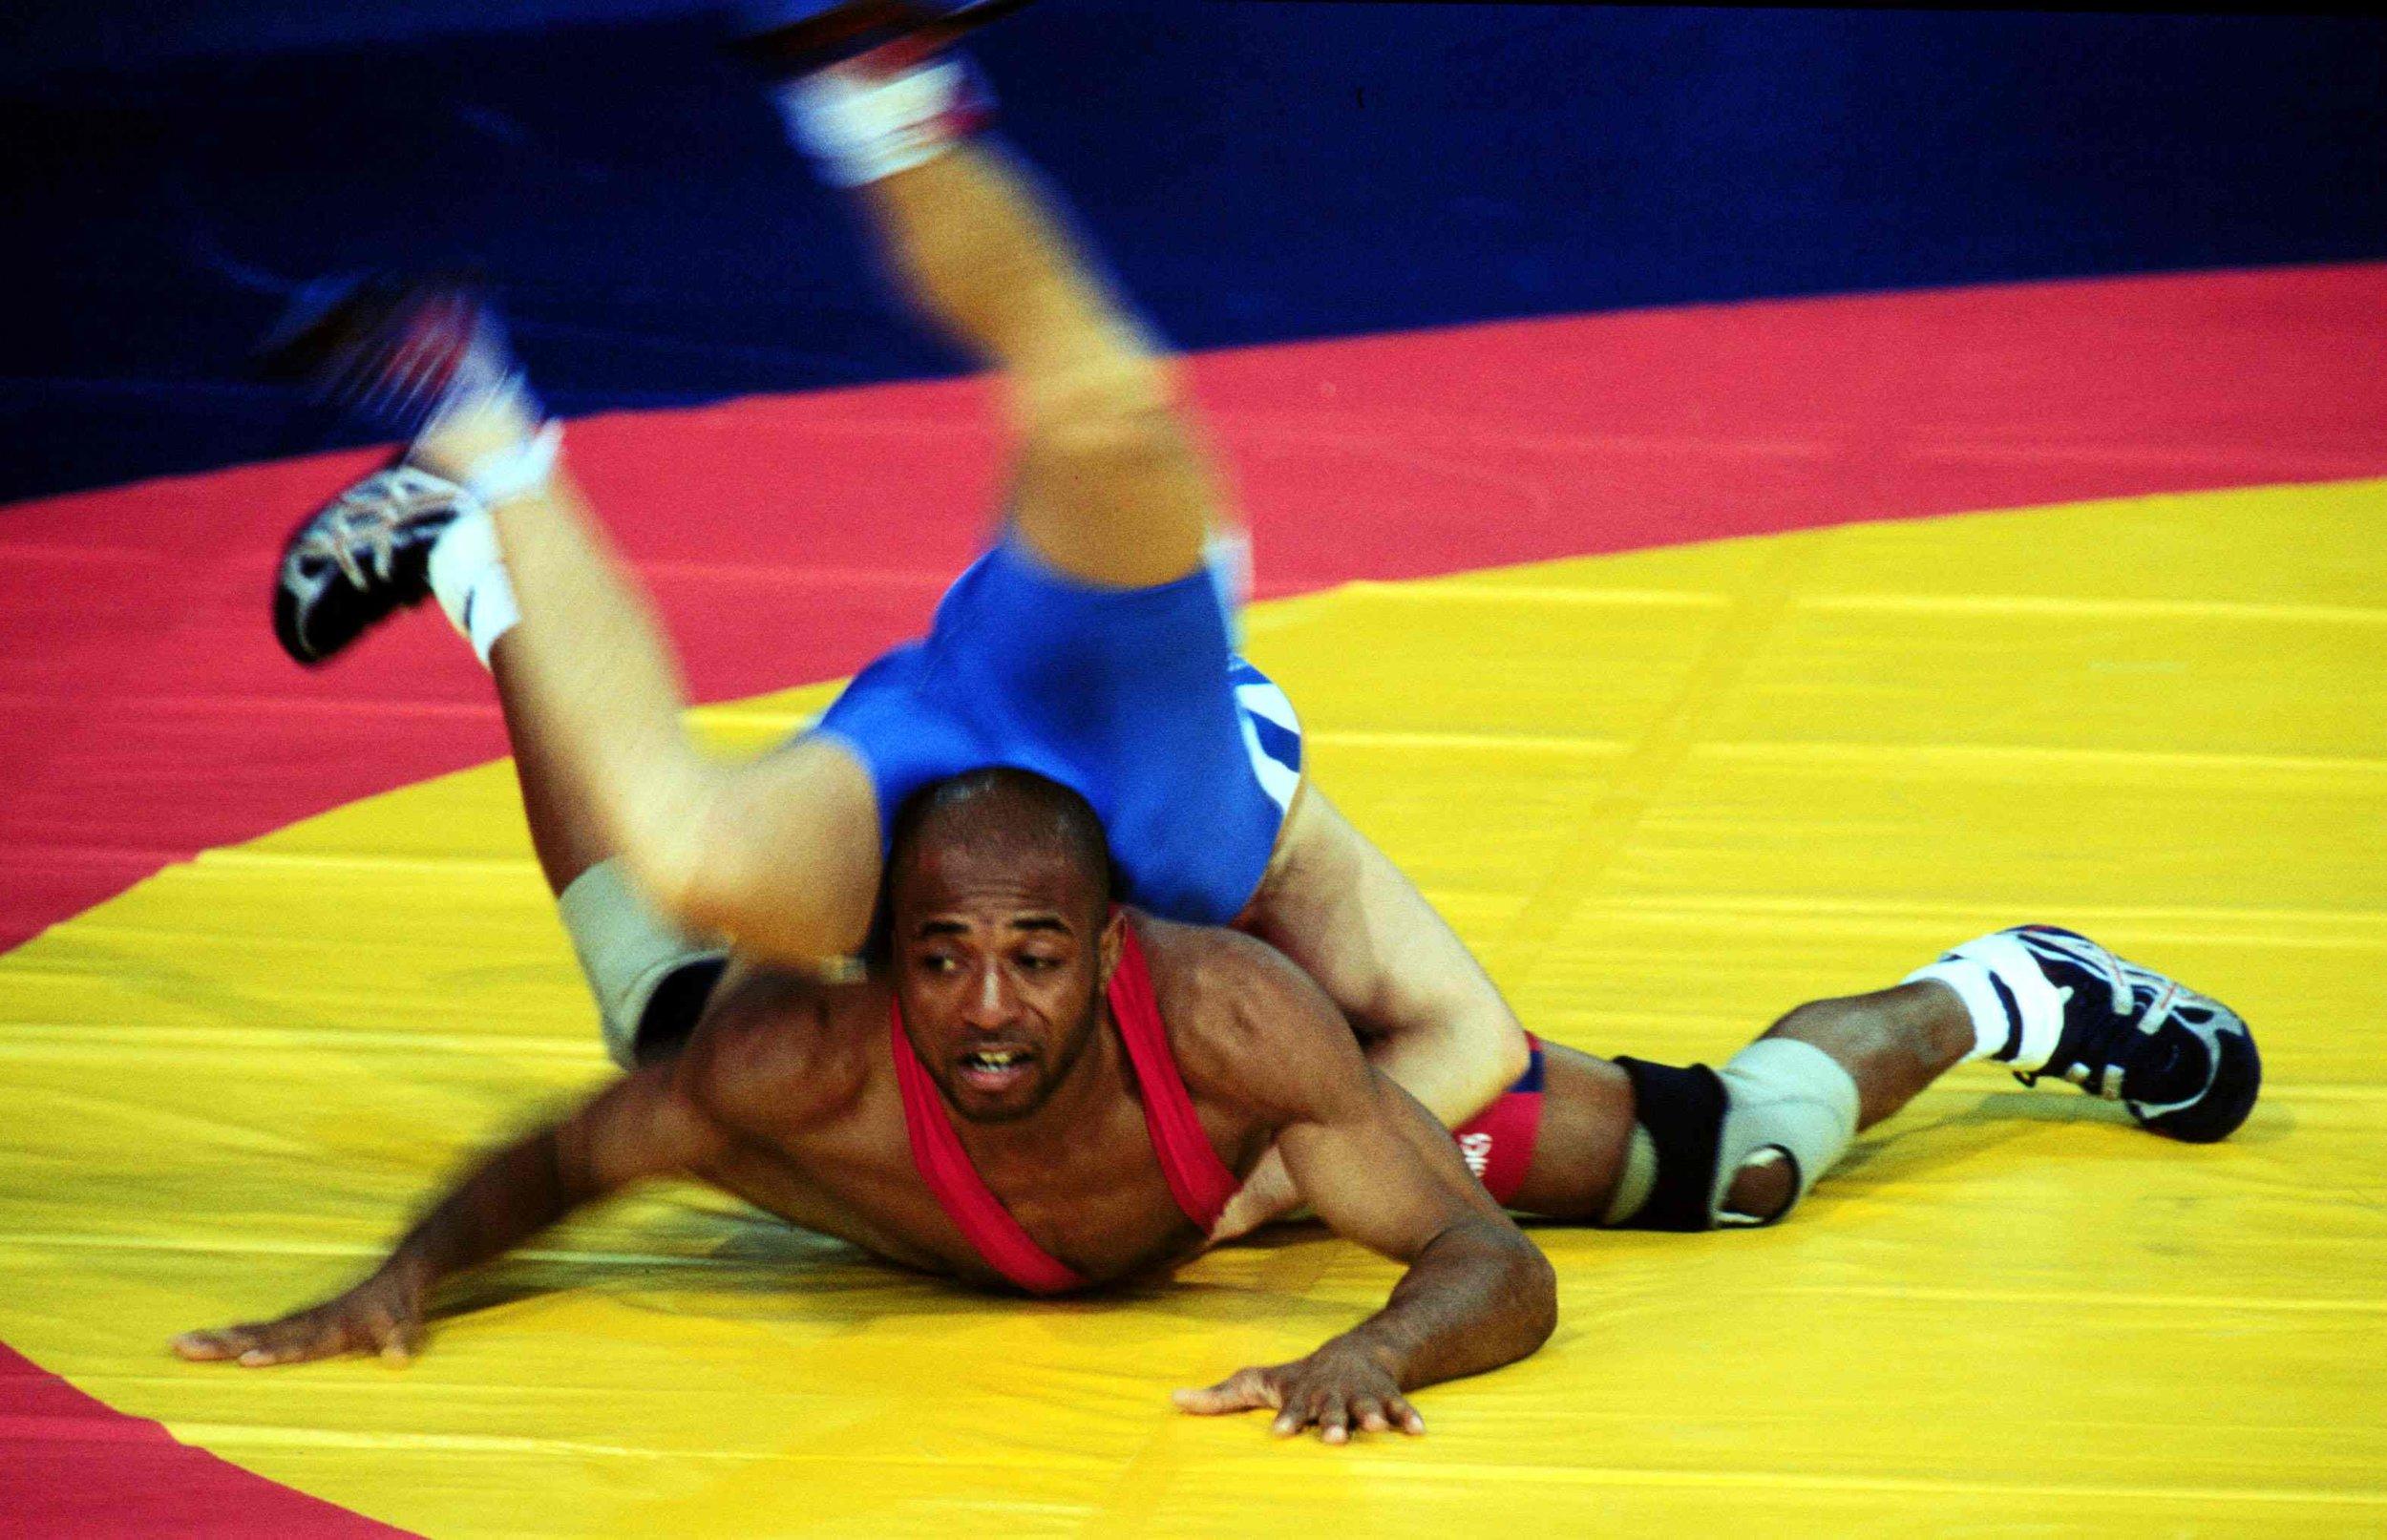 greco-roman-wrestling-indeed1.jpg